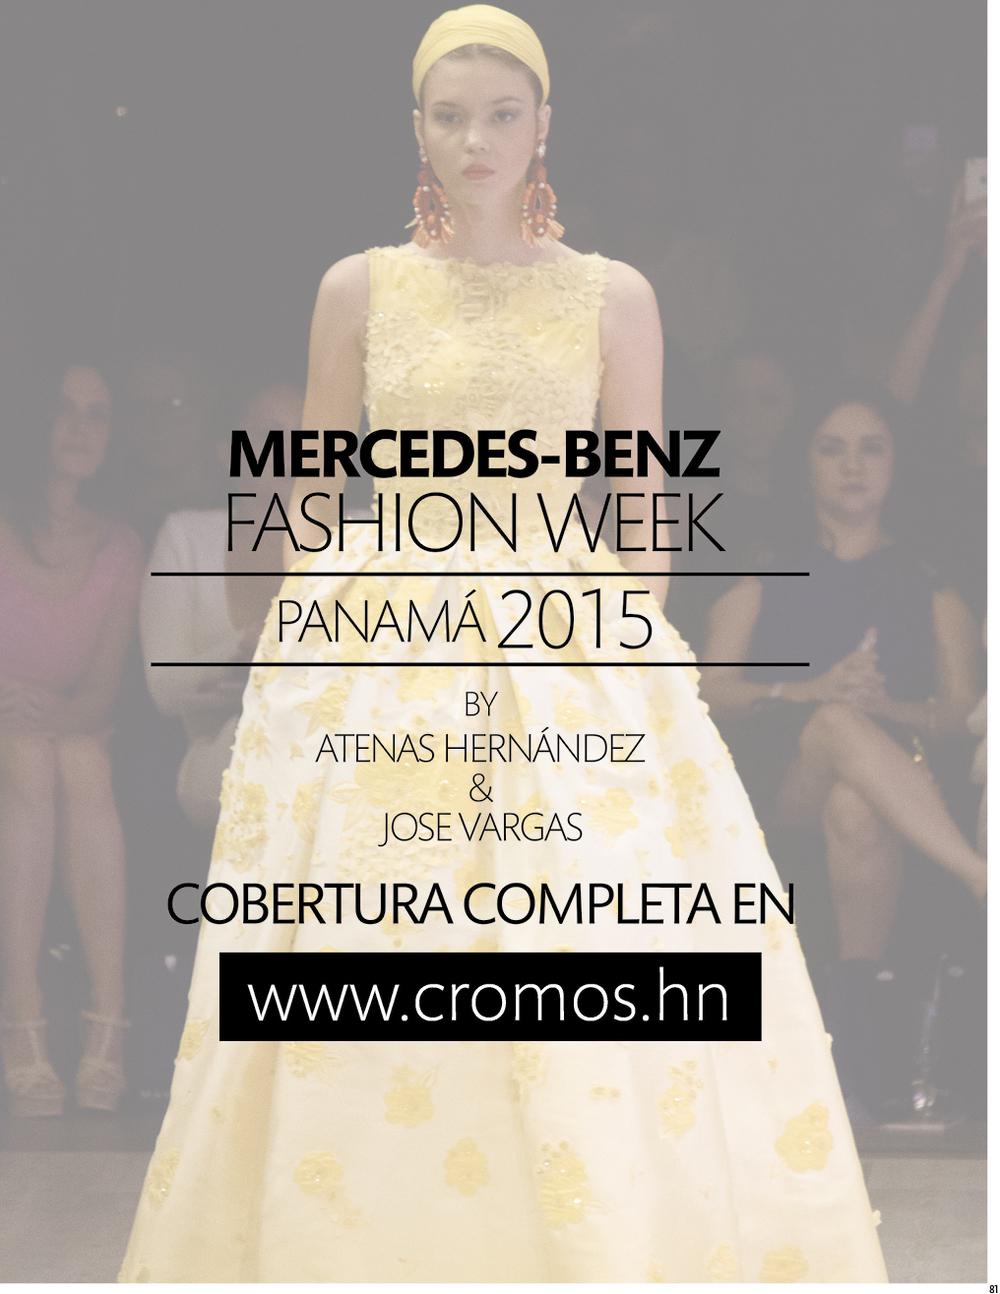 Cobertura de Panama Fashion Week para Cromos.hn